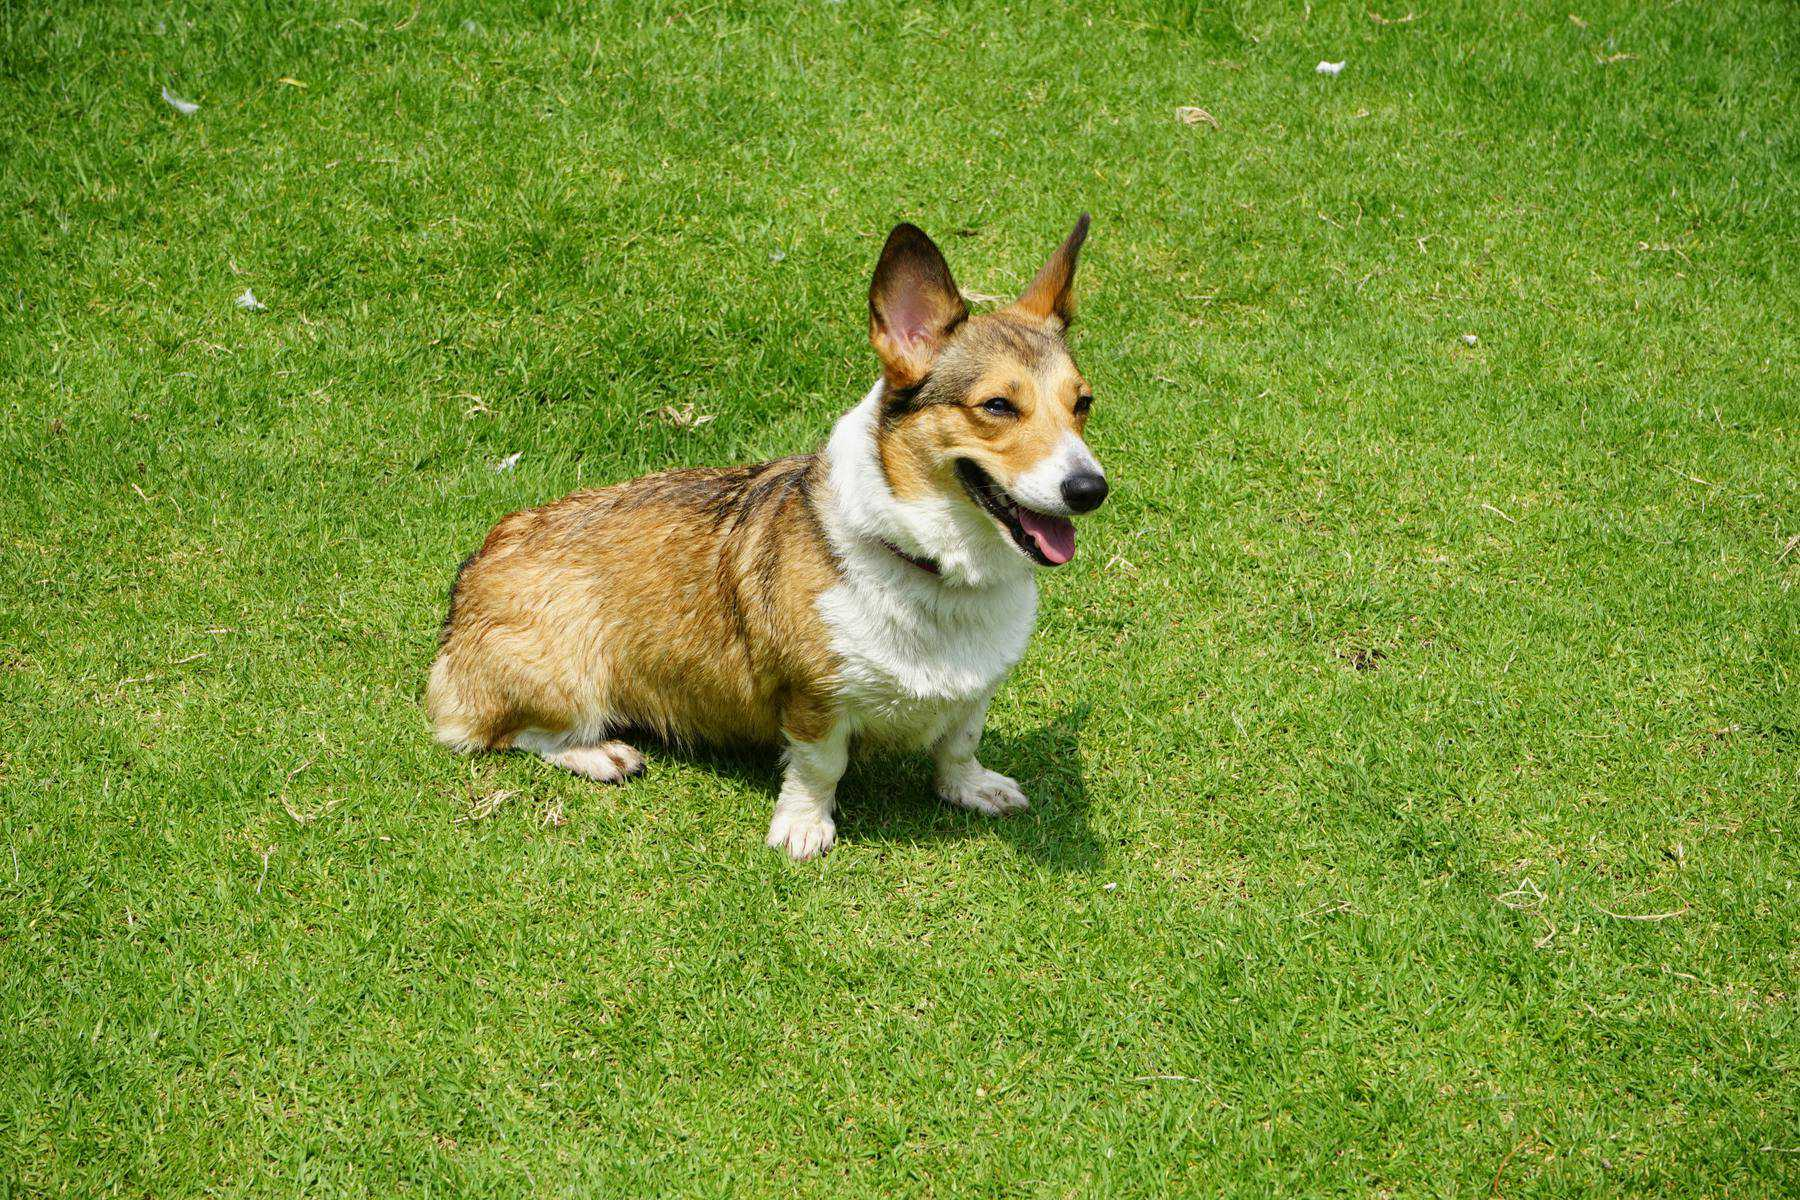 Cardigan Welsh Corgi Dog Breed Information - K9 Web